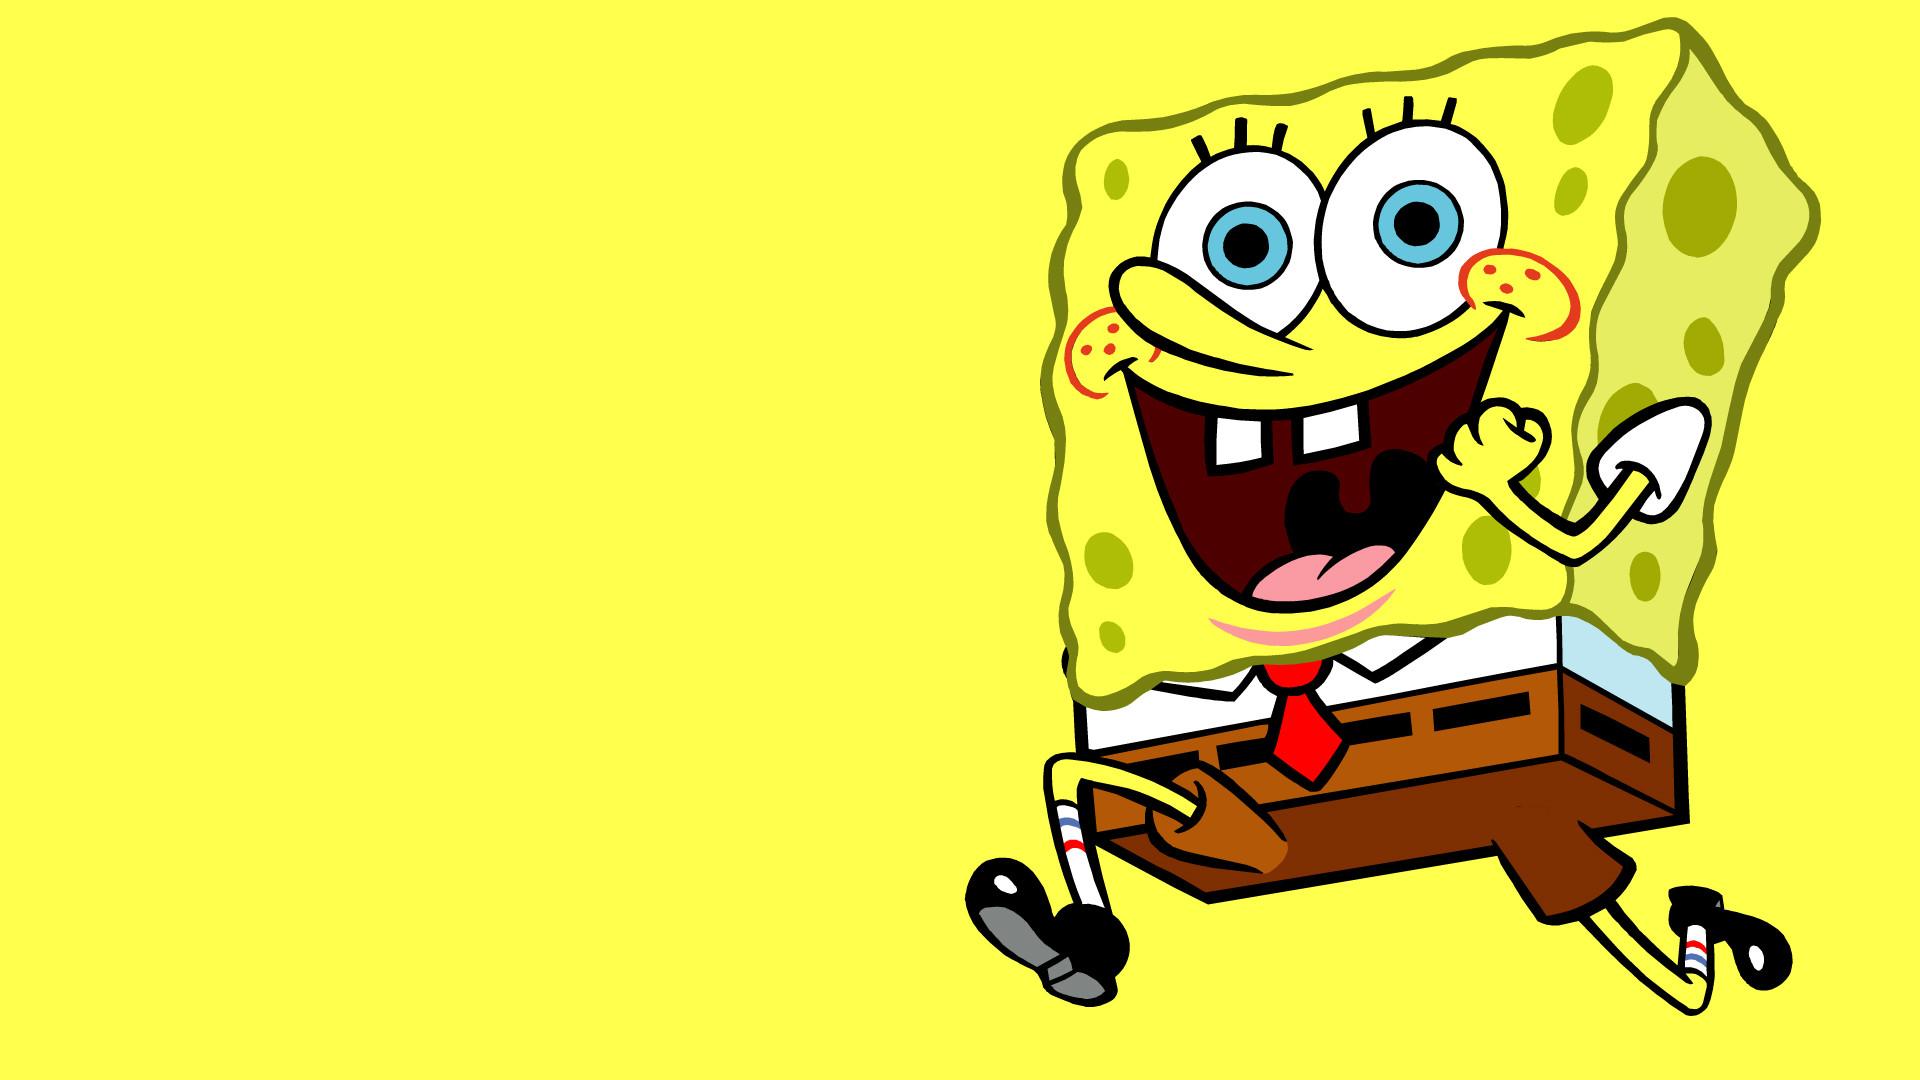 best images about spongebob phone wallpaper on Pinterest Bobs